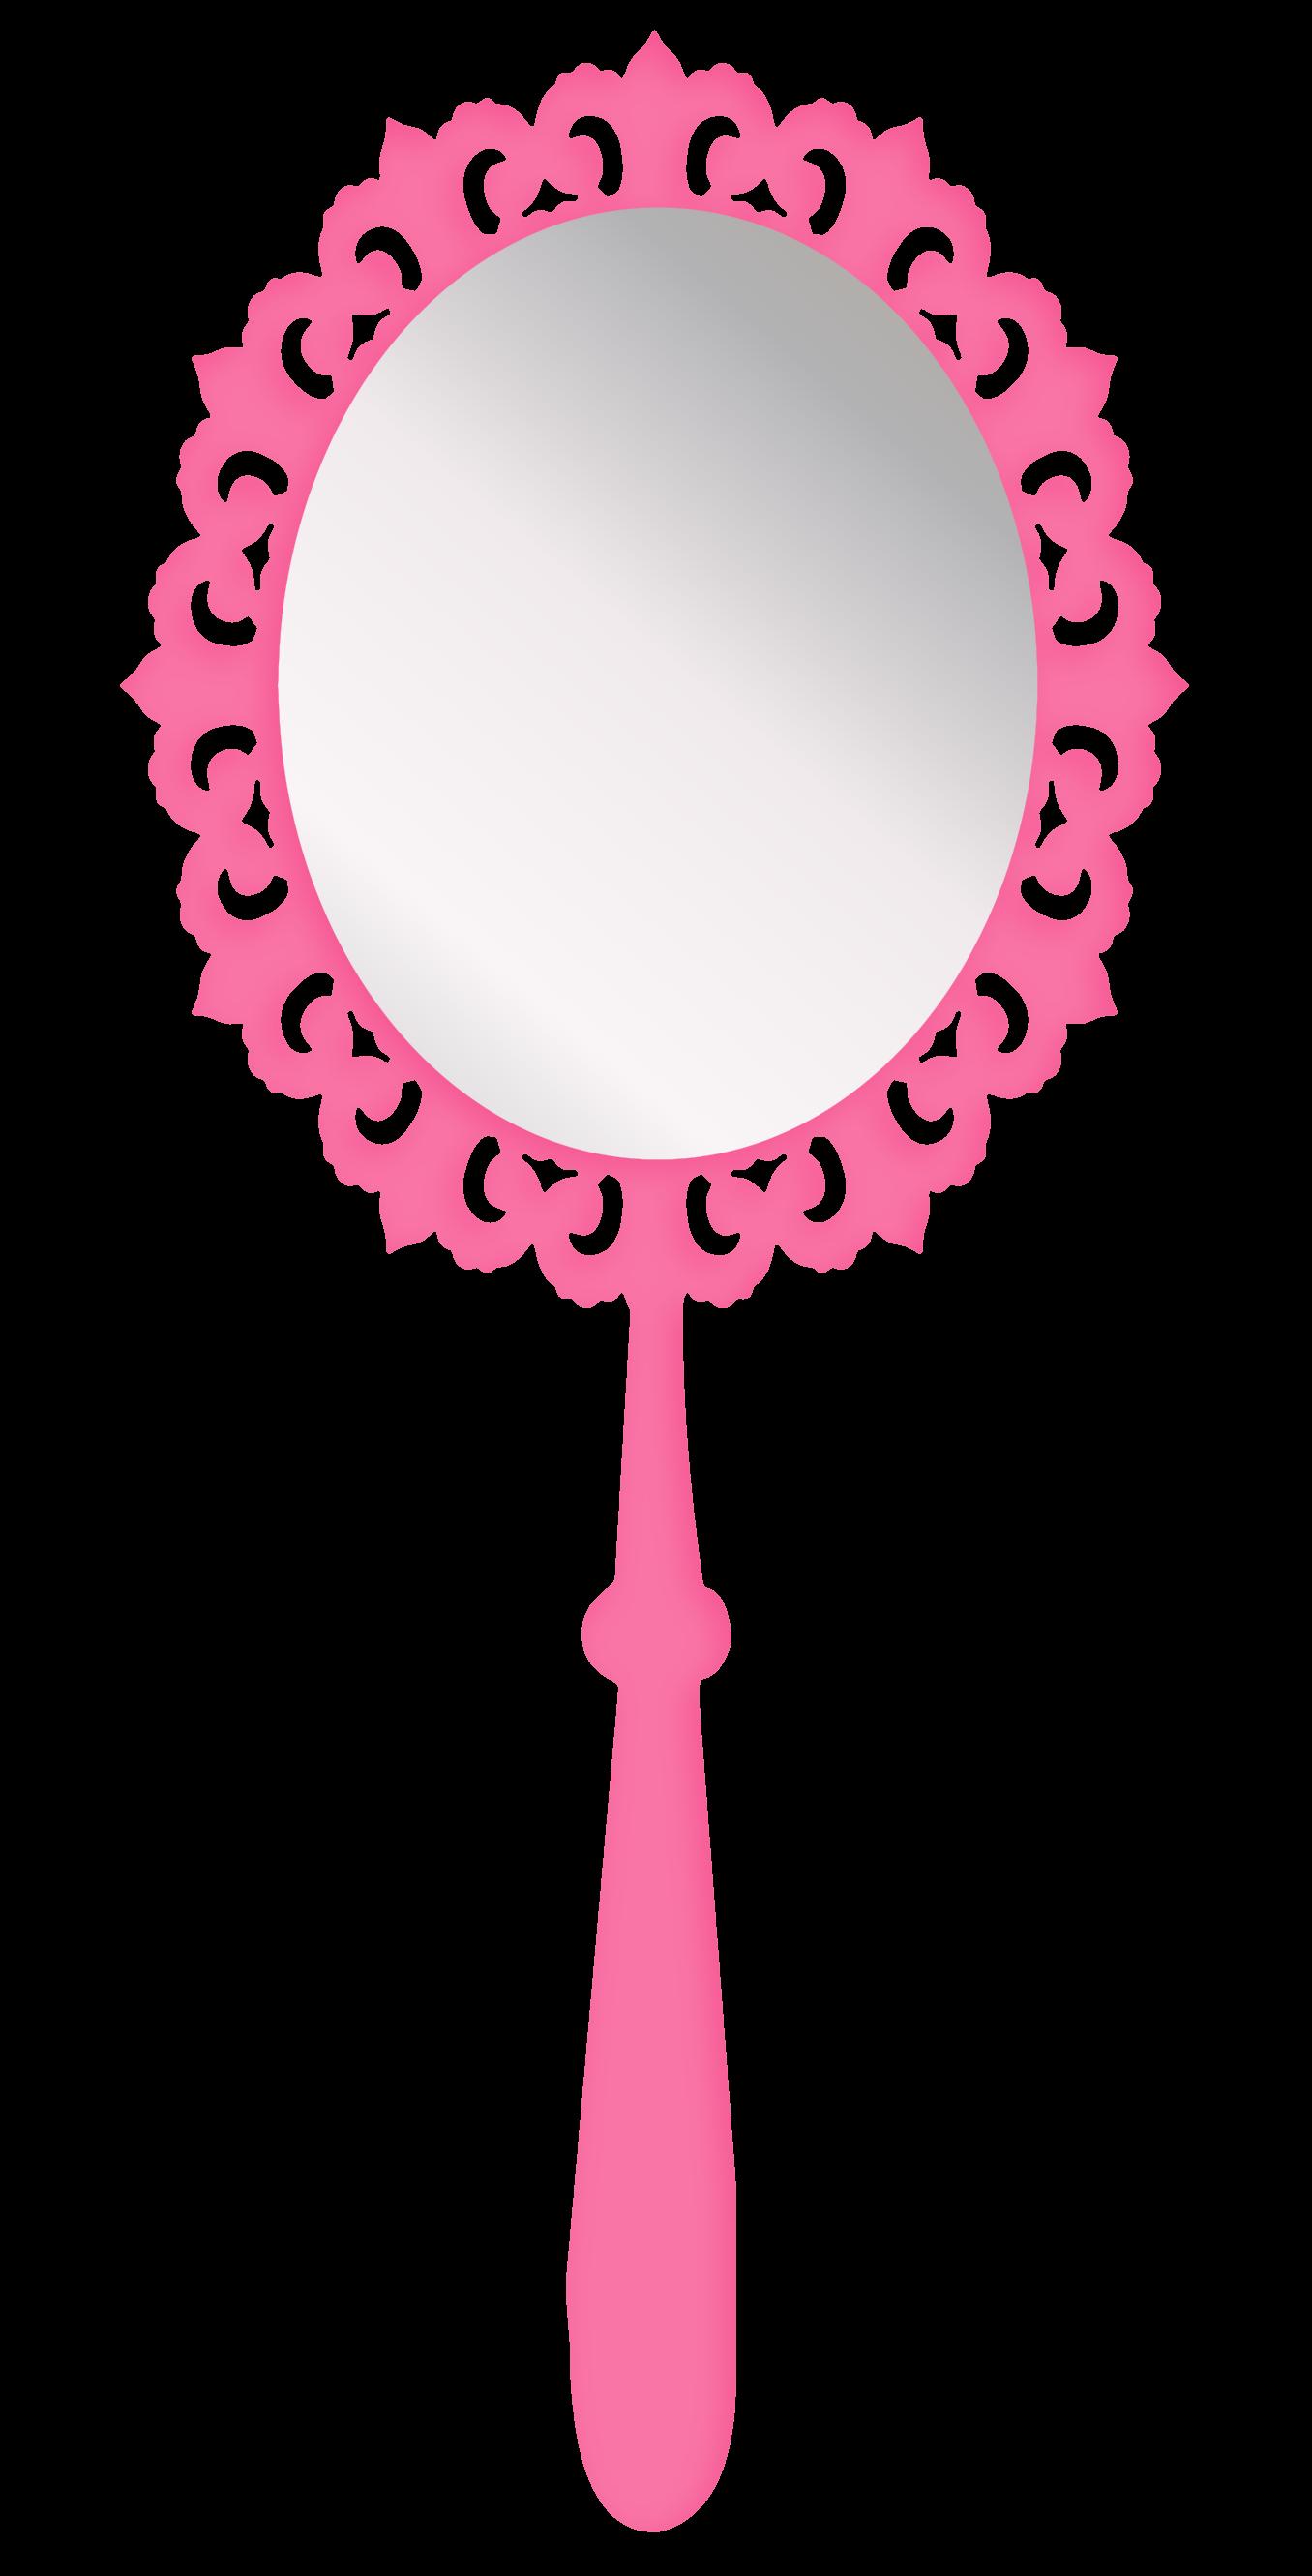 Girl clipart mirror. Photo by rosimeri minus